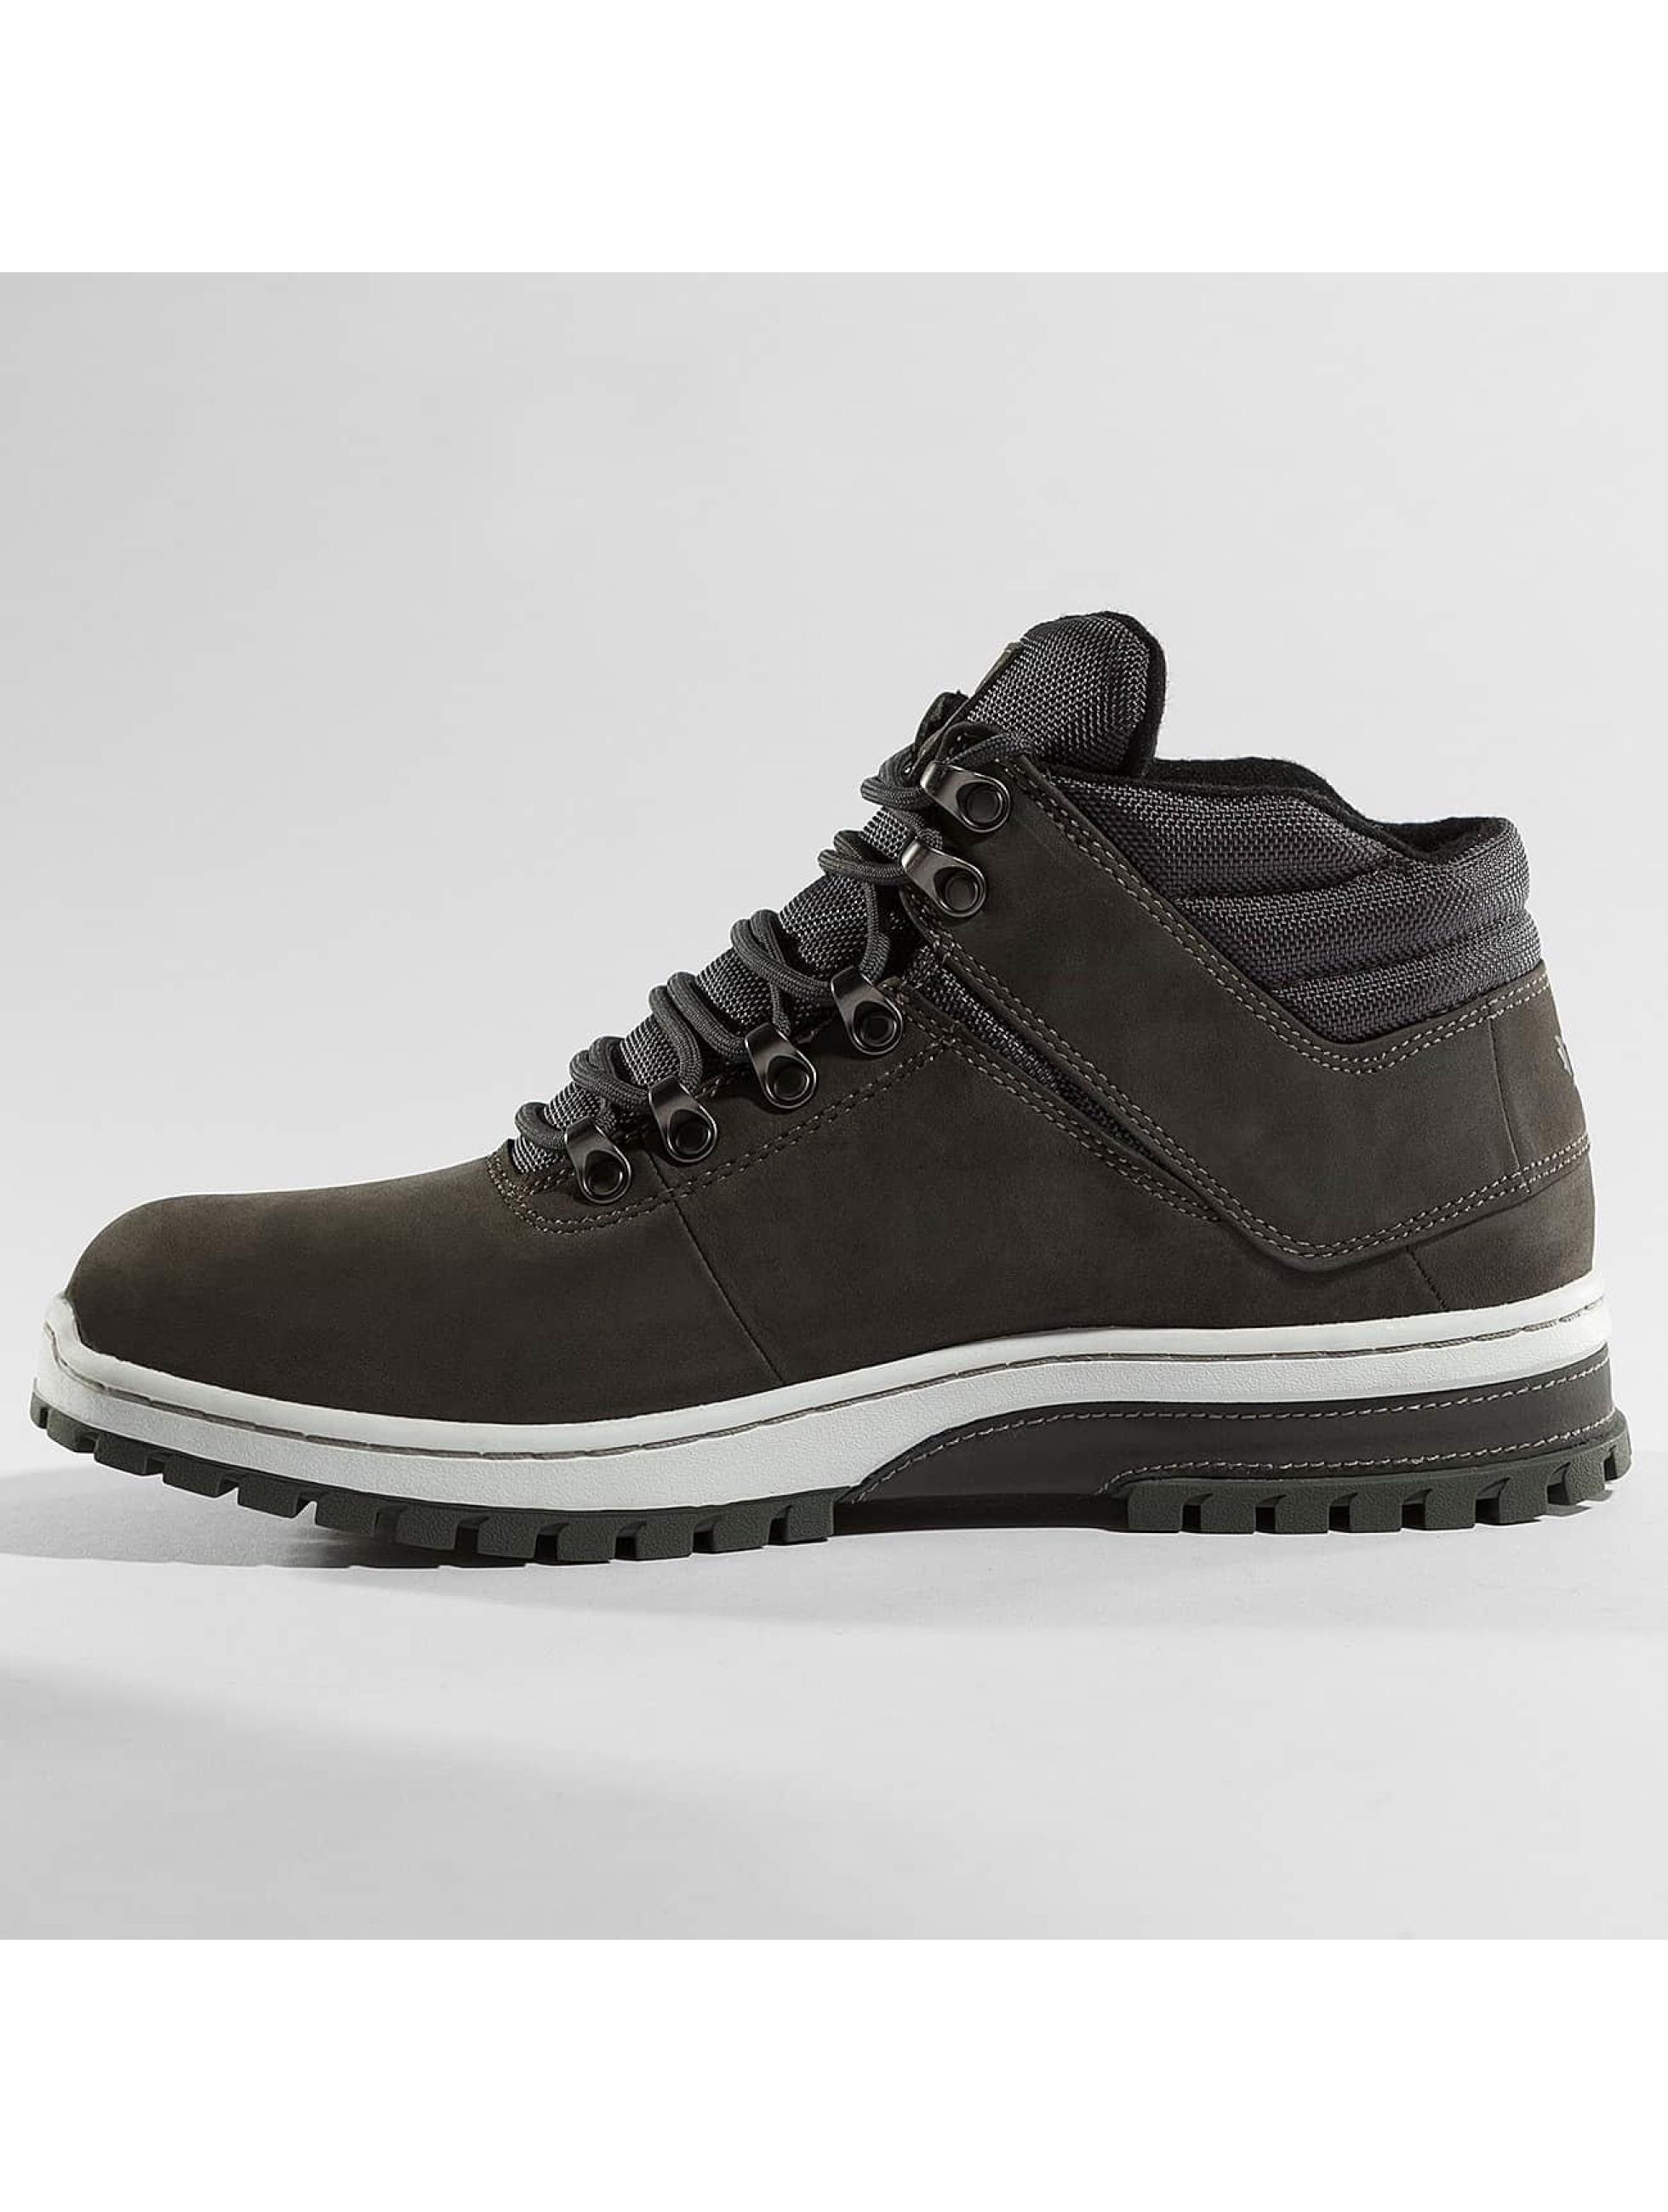 K1X Chaussures montantes H1ke Territory gris